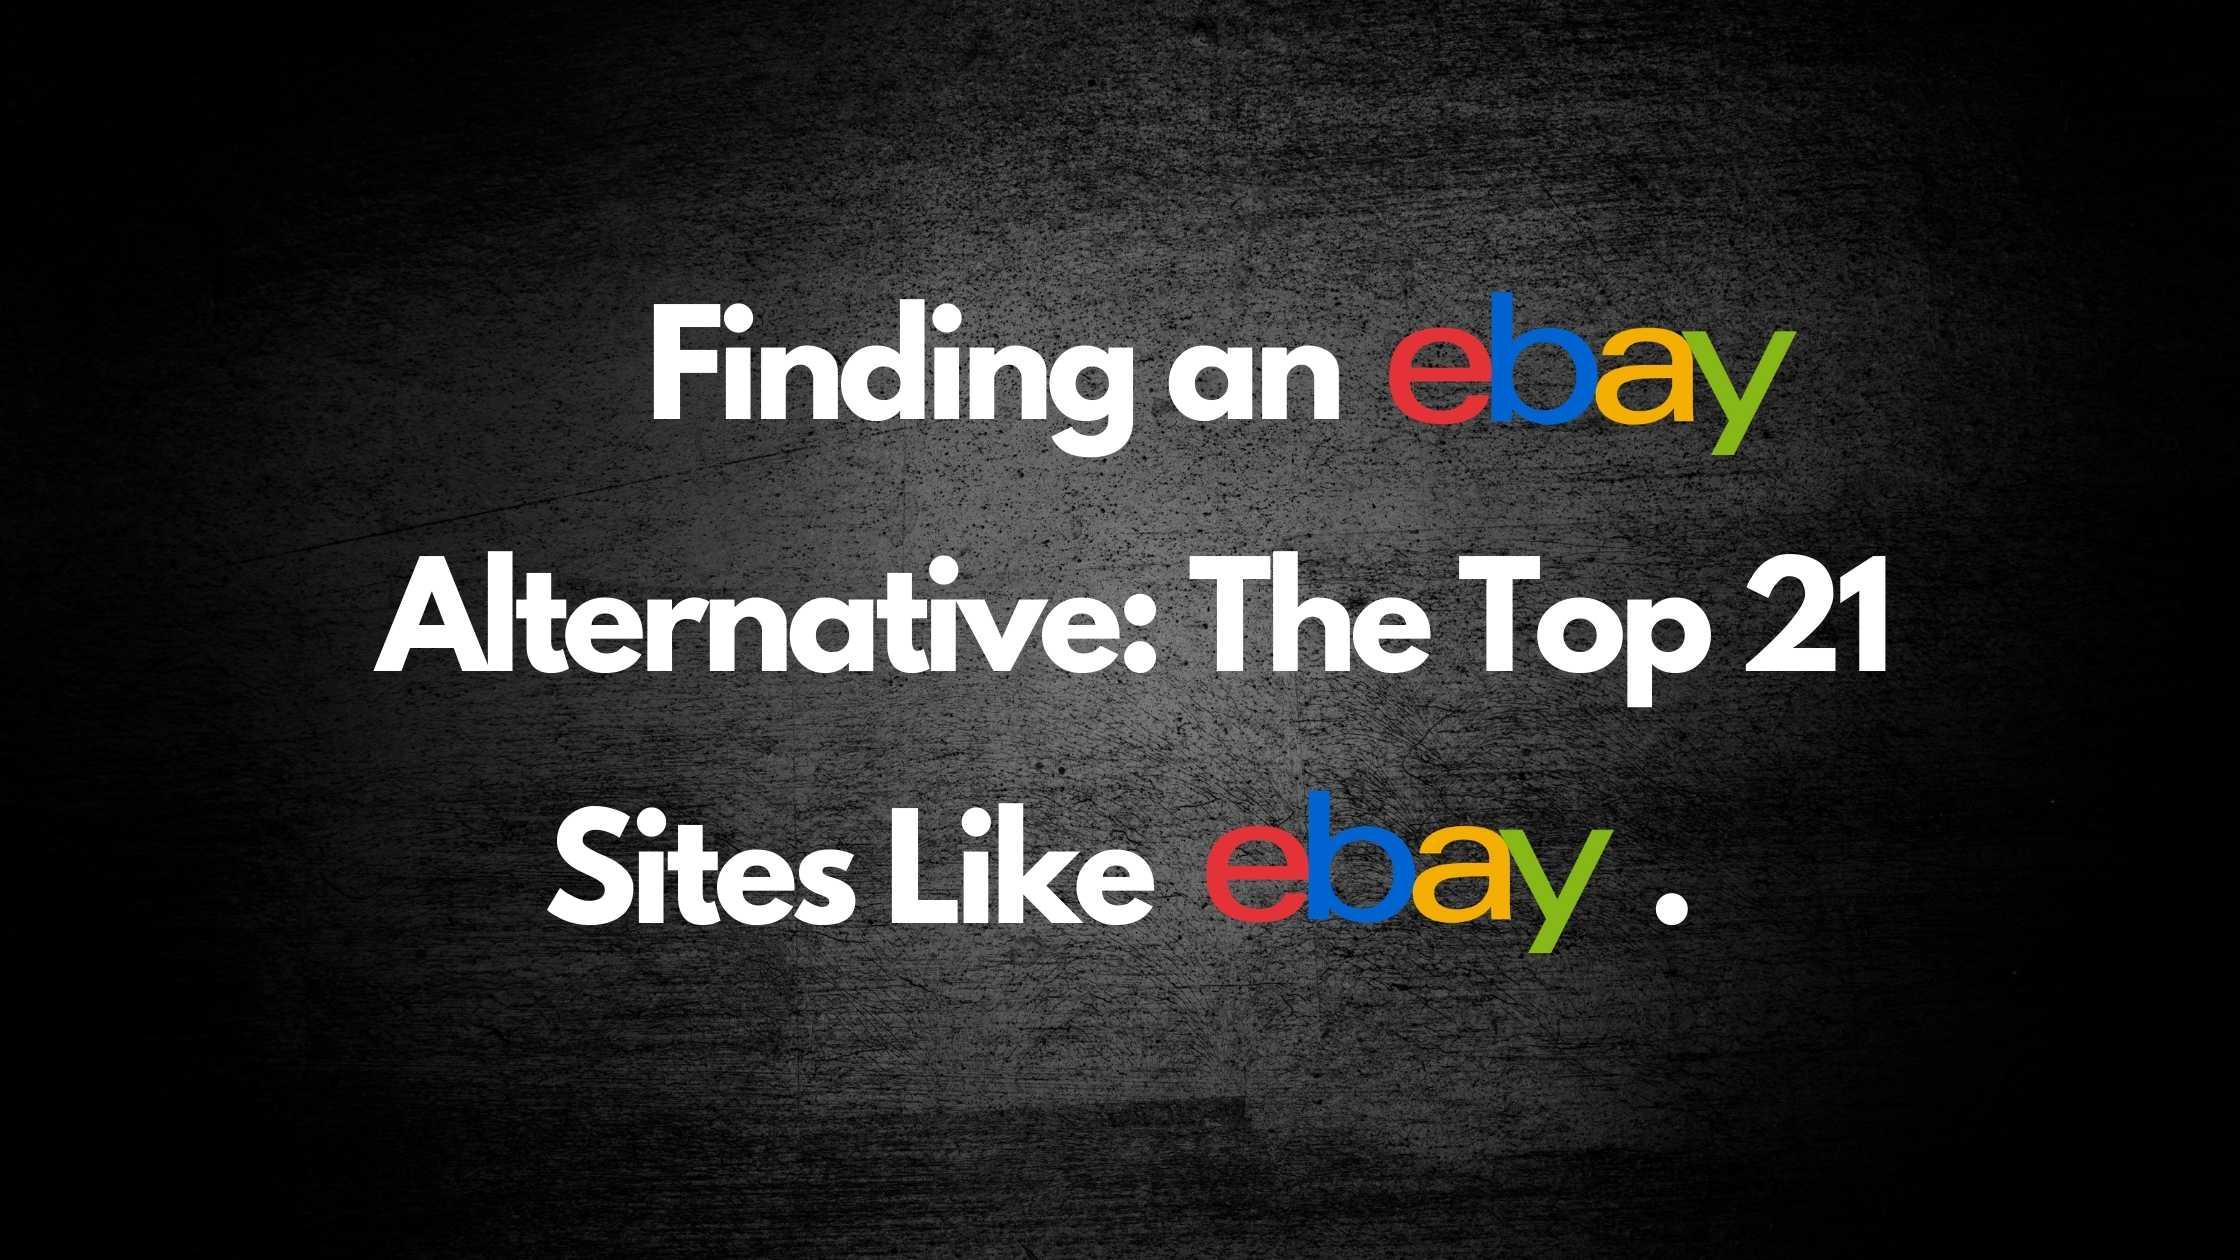 Finding an ebay alternative, The Top 21 sites like ebay